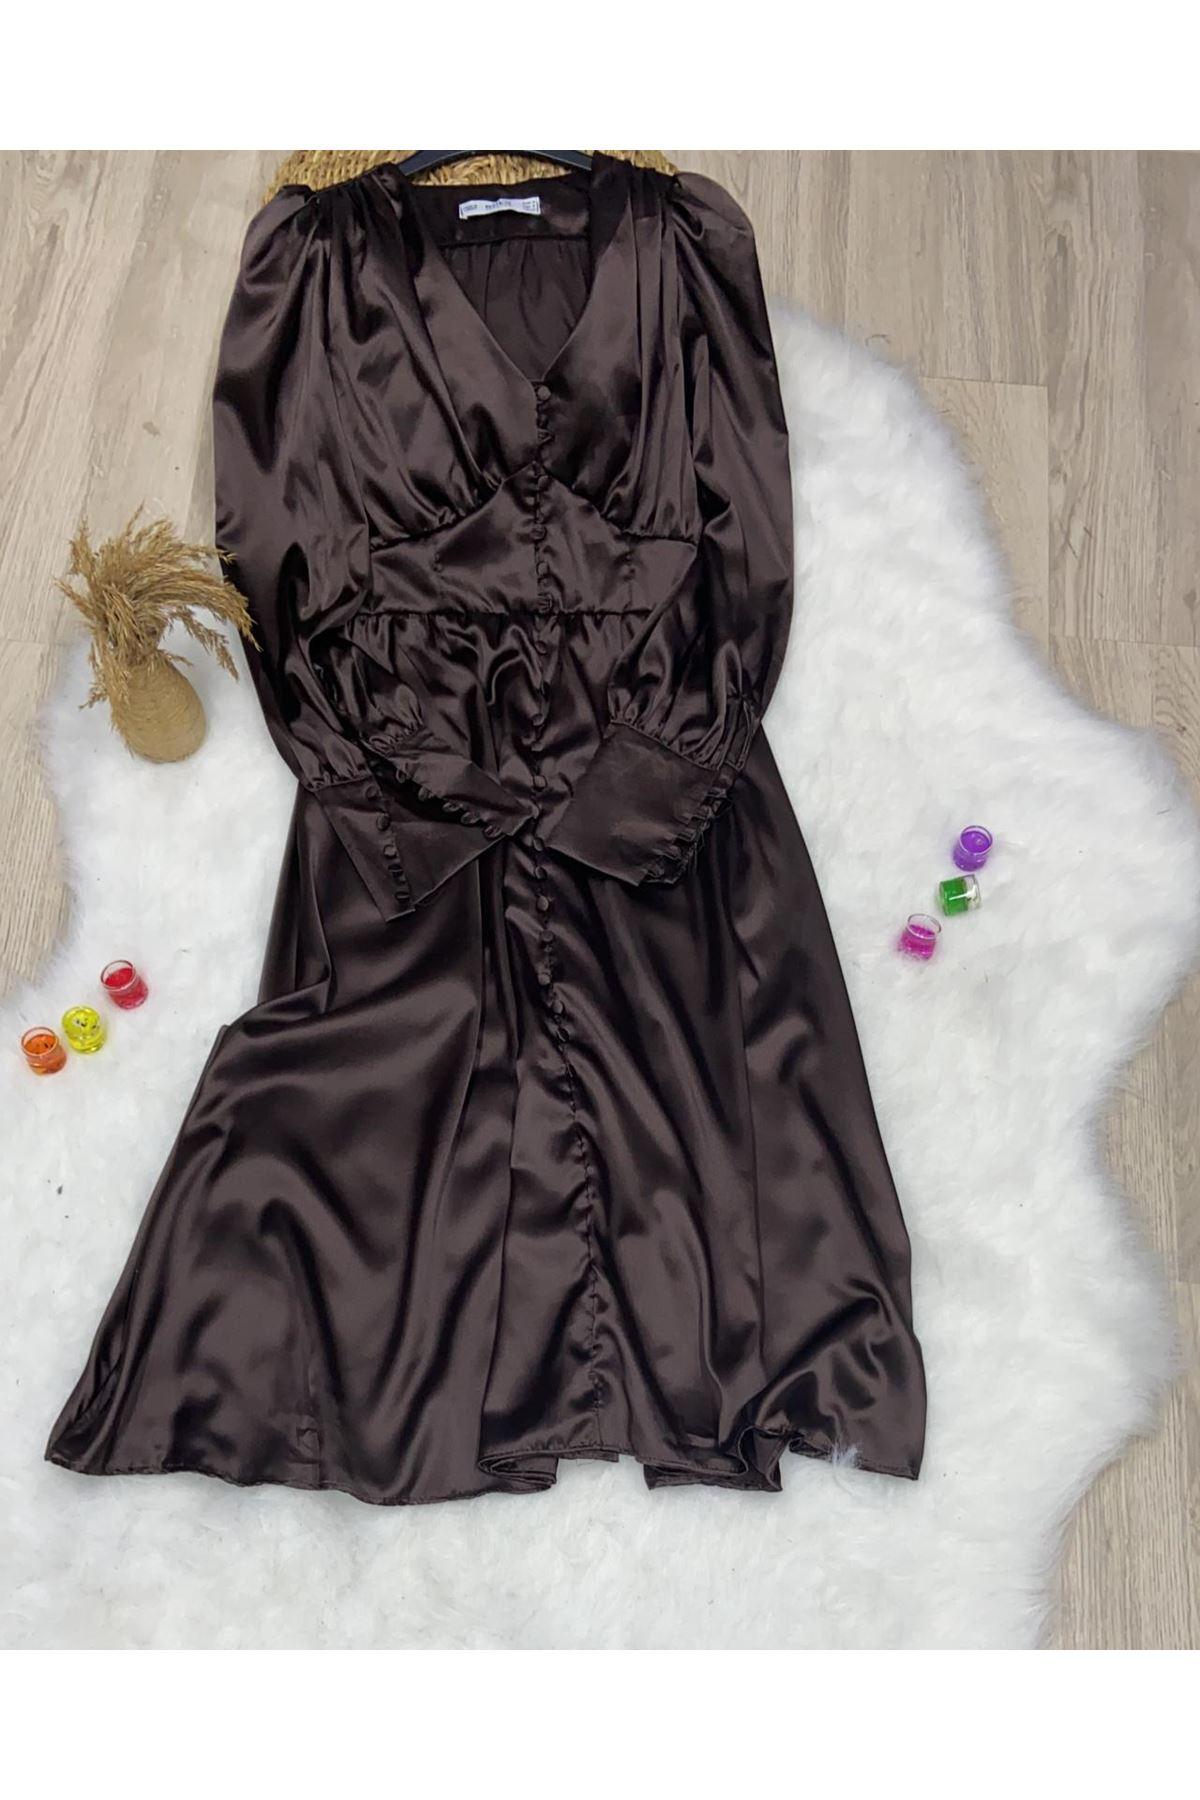 Kol Manşet Saten Elbise  - BORDO